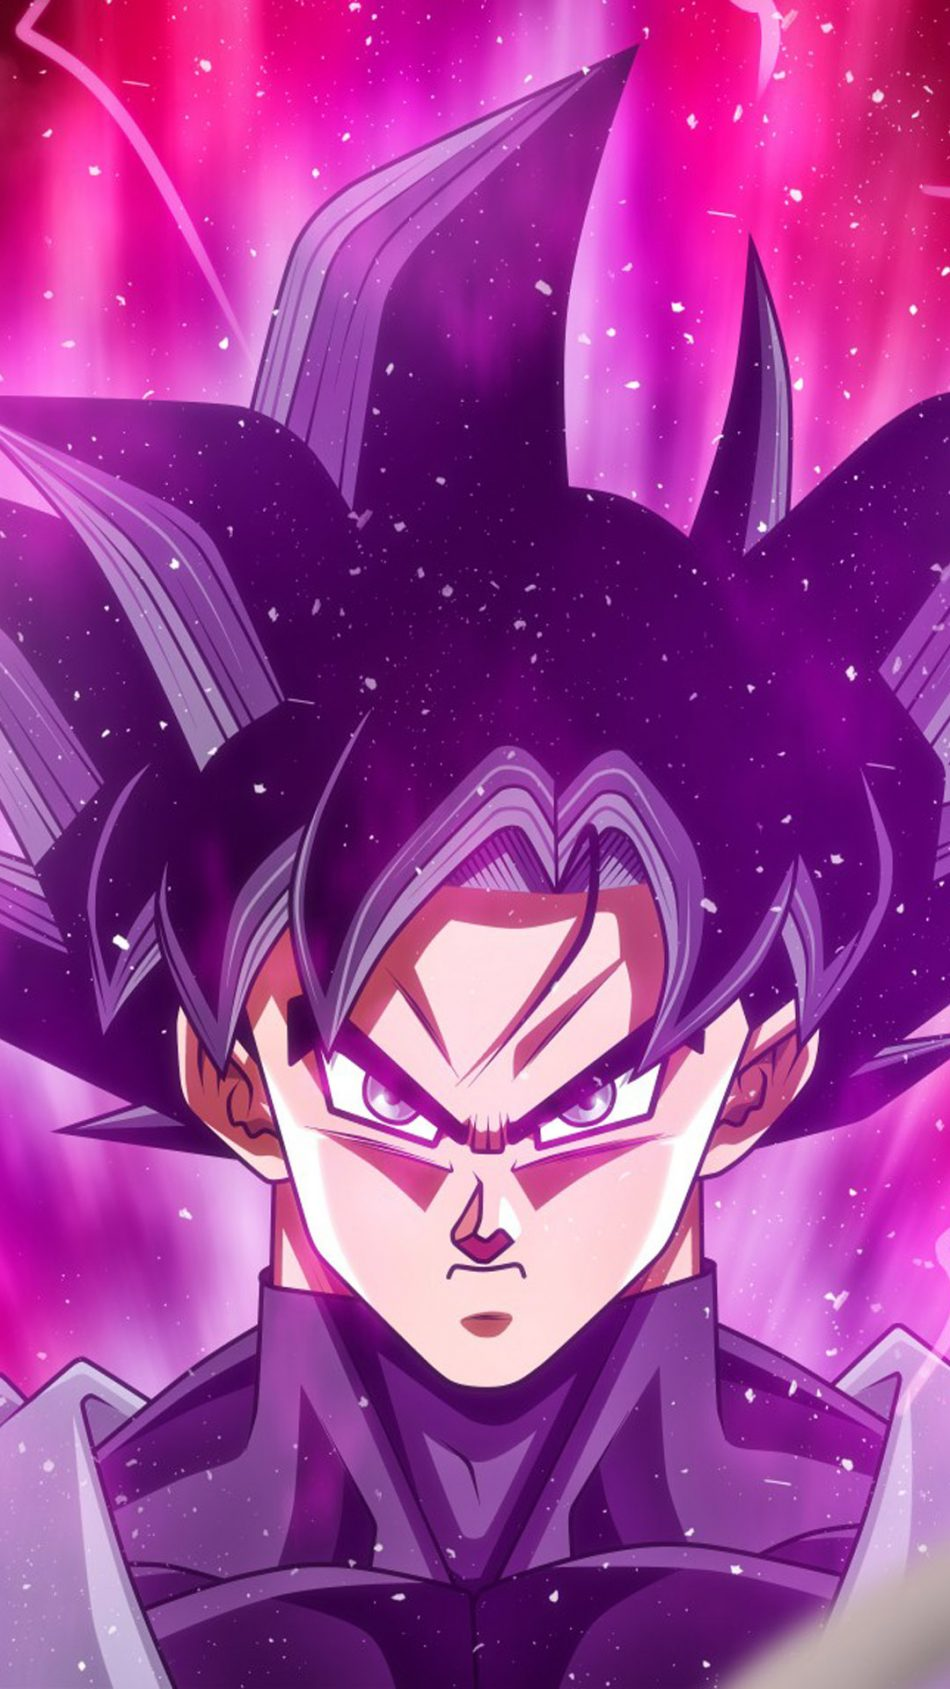 Goku Black Dragon Ball Super 4k Ultra Hd Mobile Wallpaper